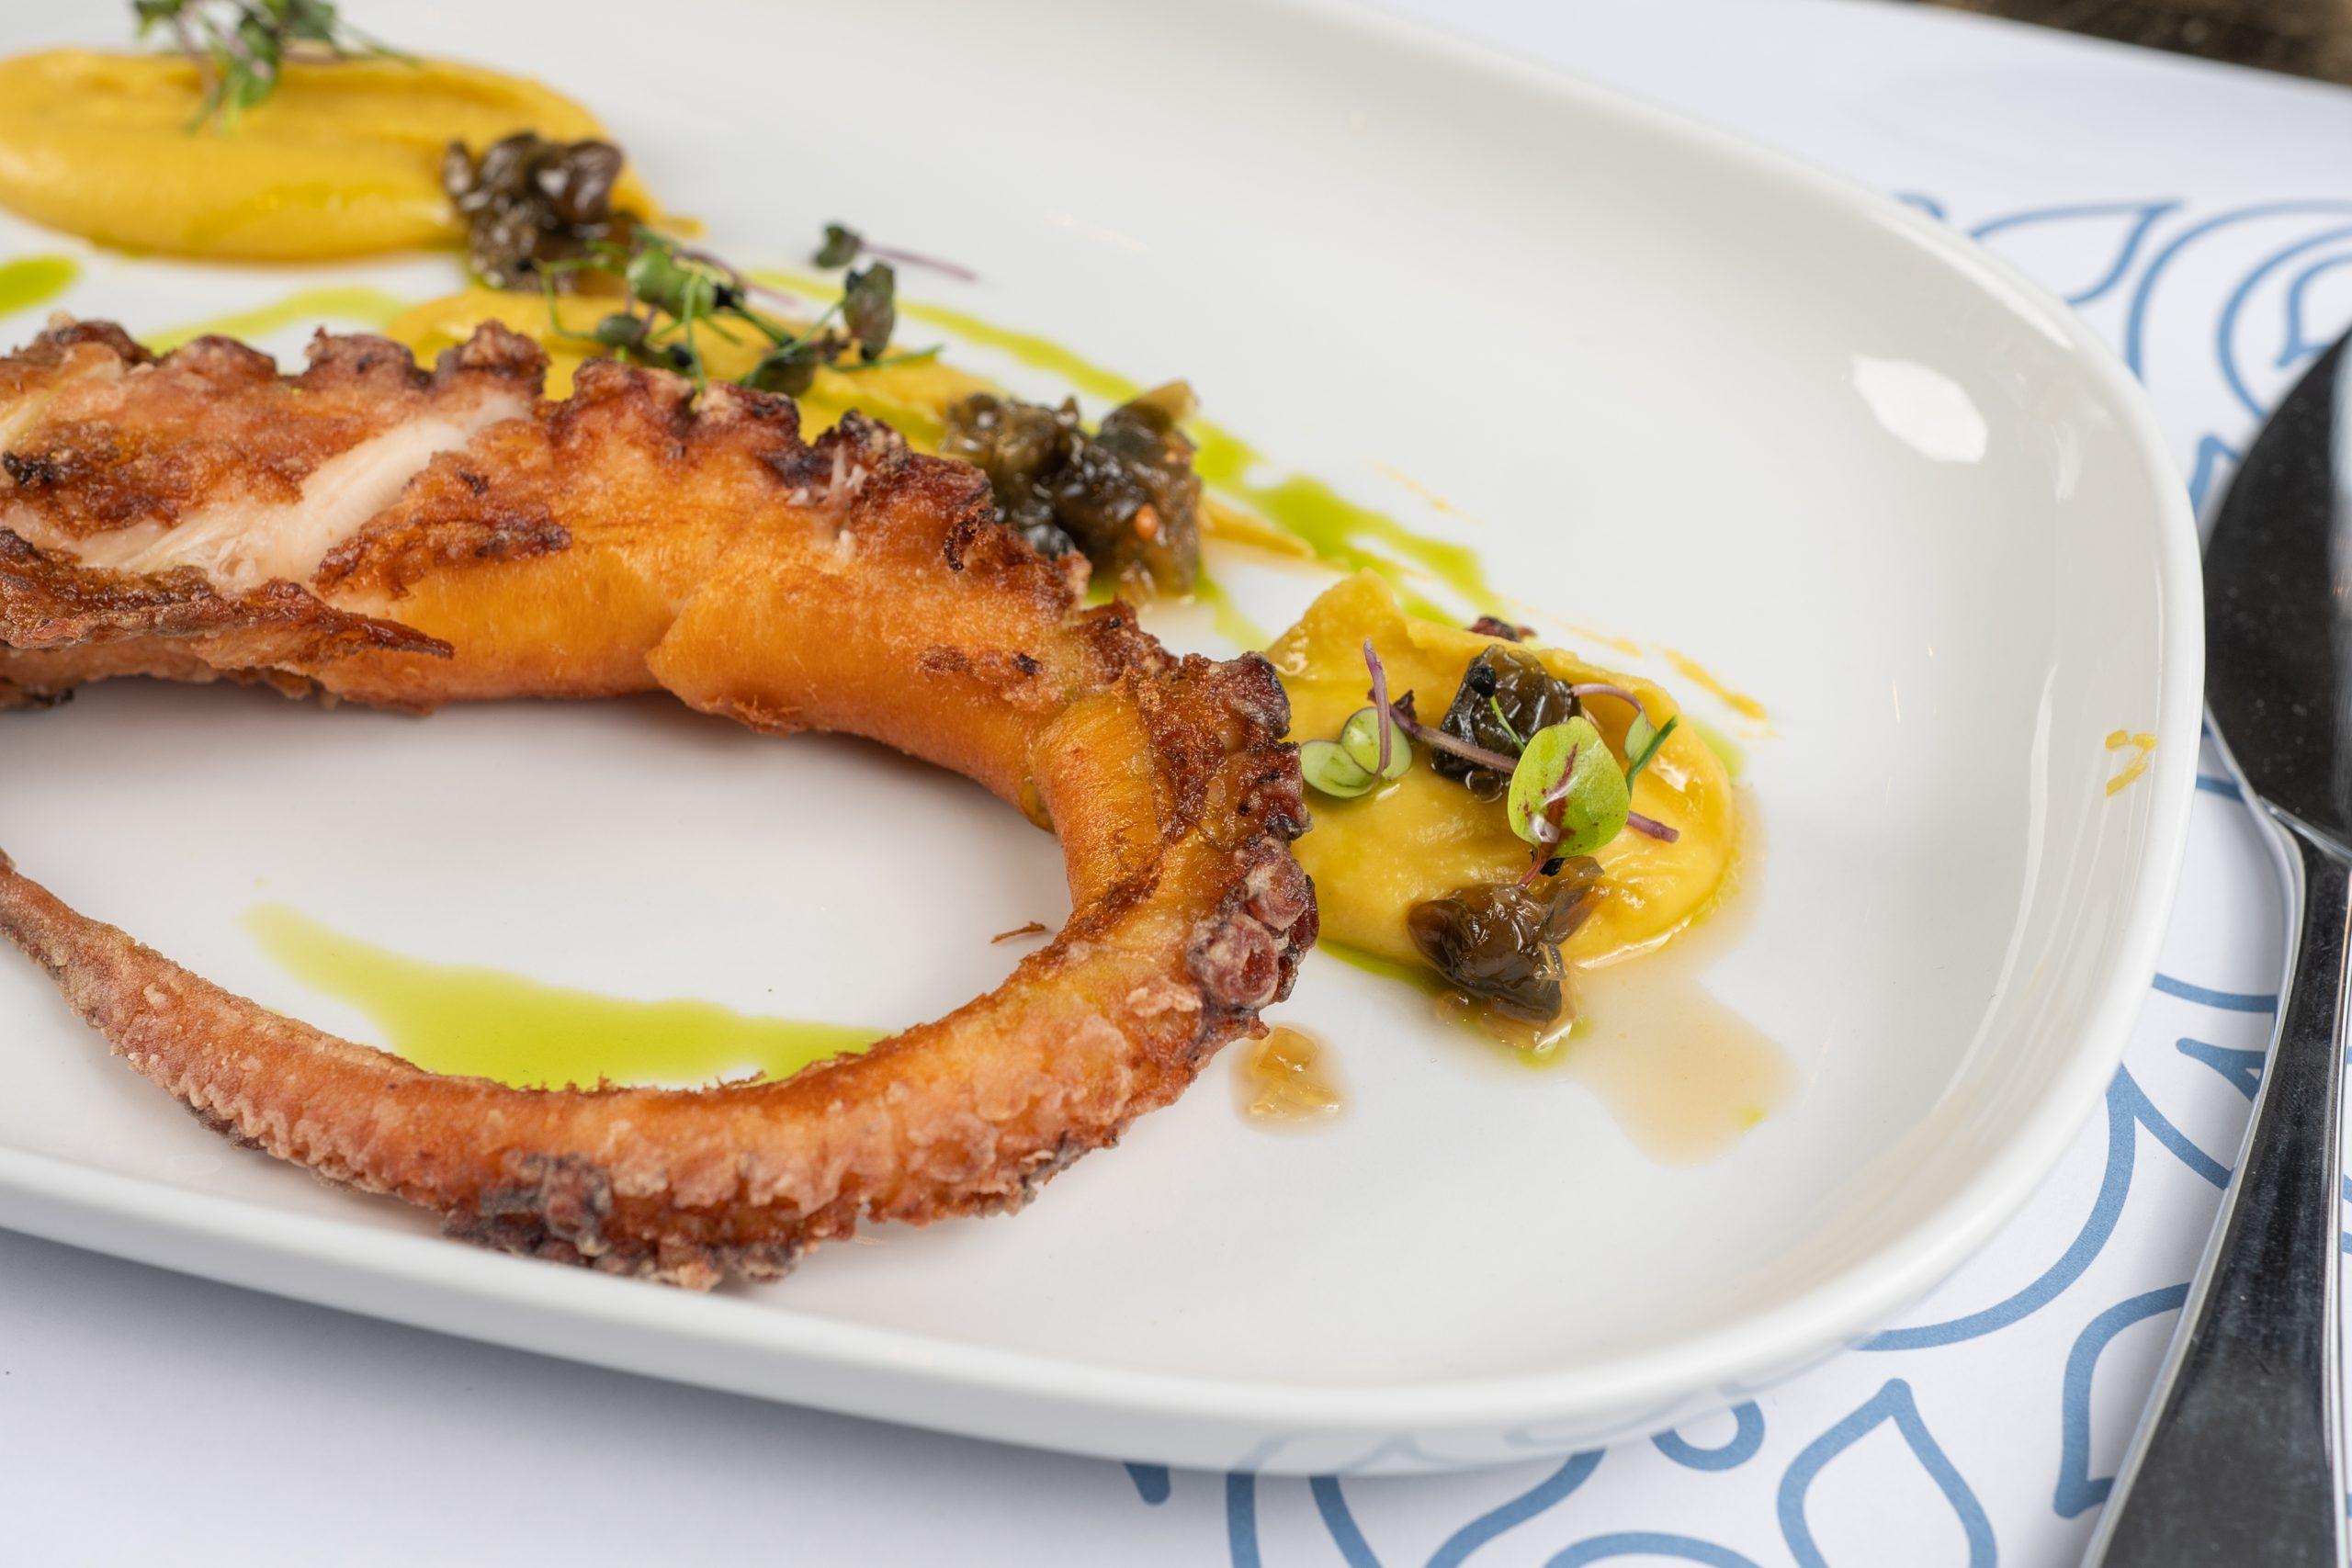 luxury seafood restaurants in Chania- Almyvita seafood restaurant in Almirida- Octopus